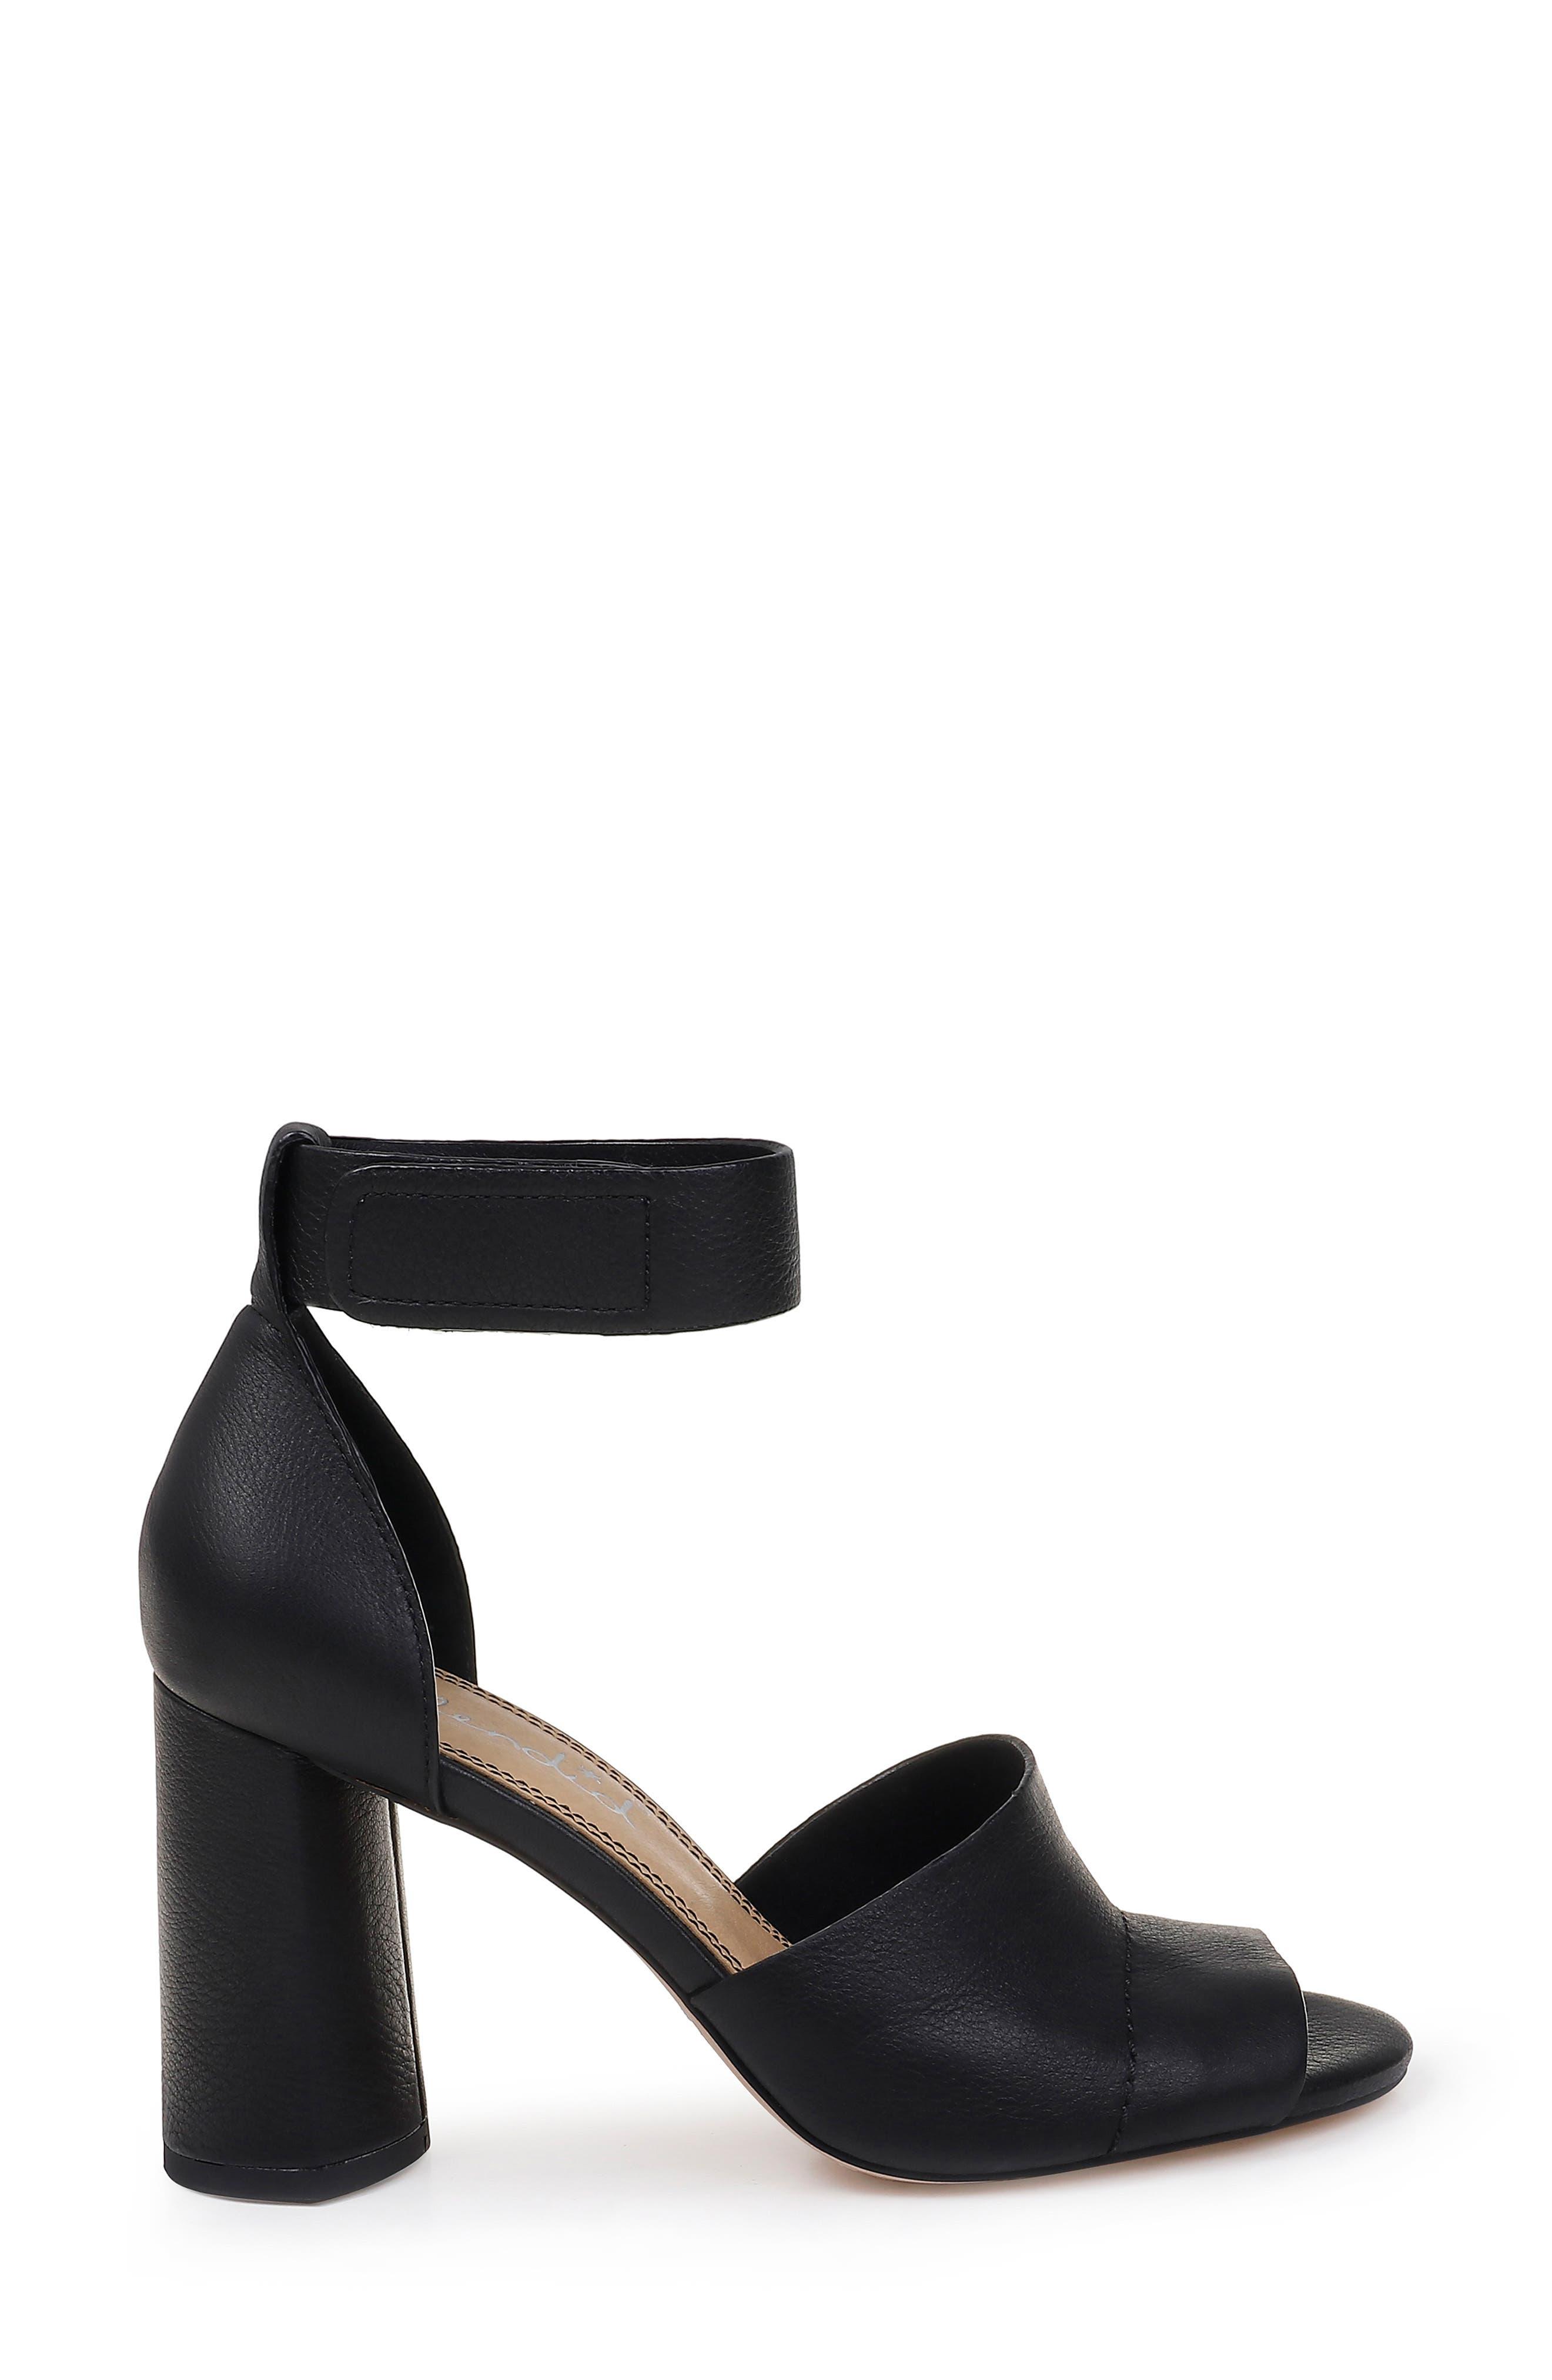 SPLENDID, Thandie Ankle Strap Sandal, Alternate thumbnail 3, color, BLACK NUBUCK LEATHER